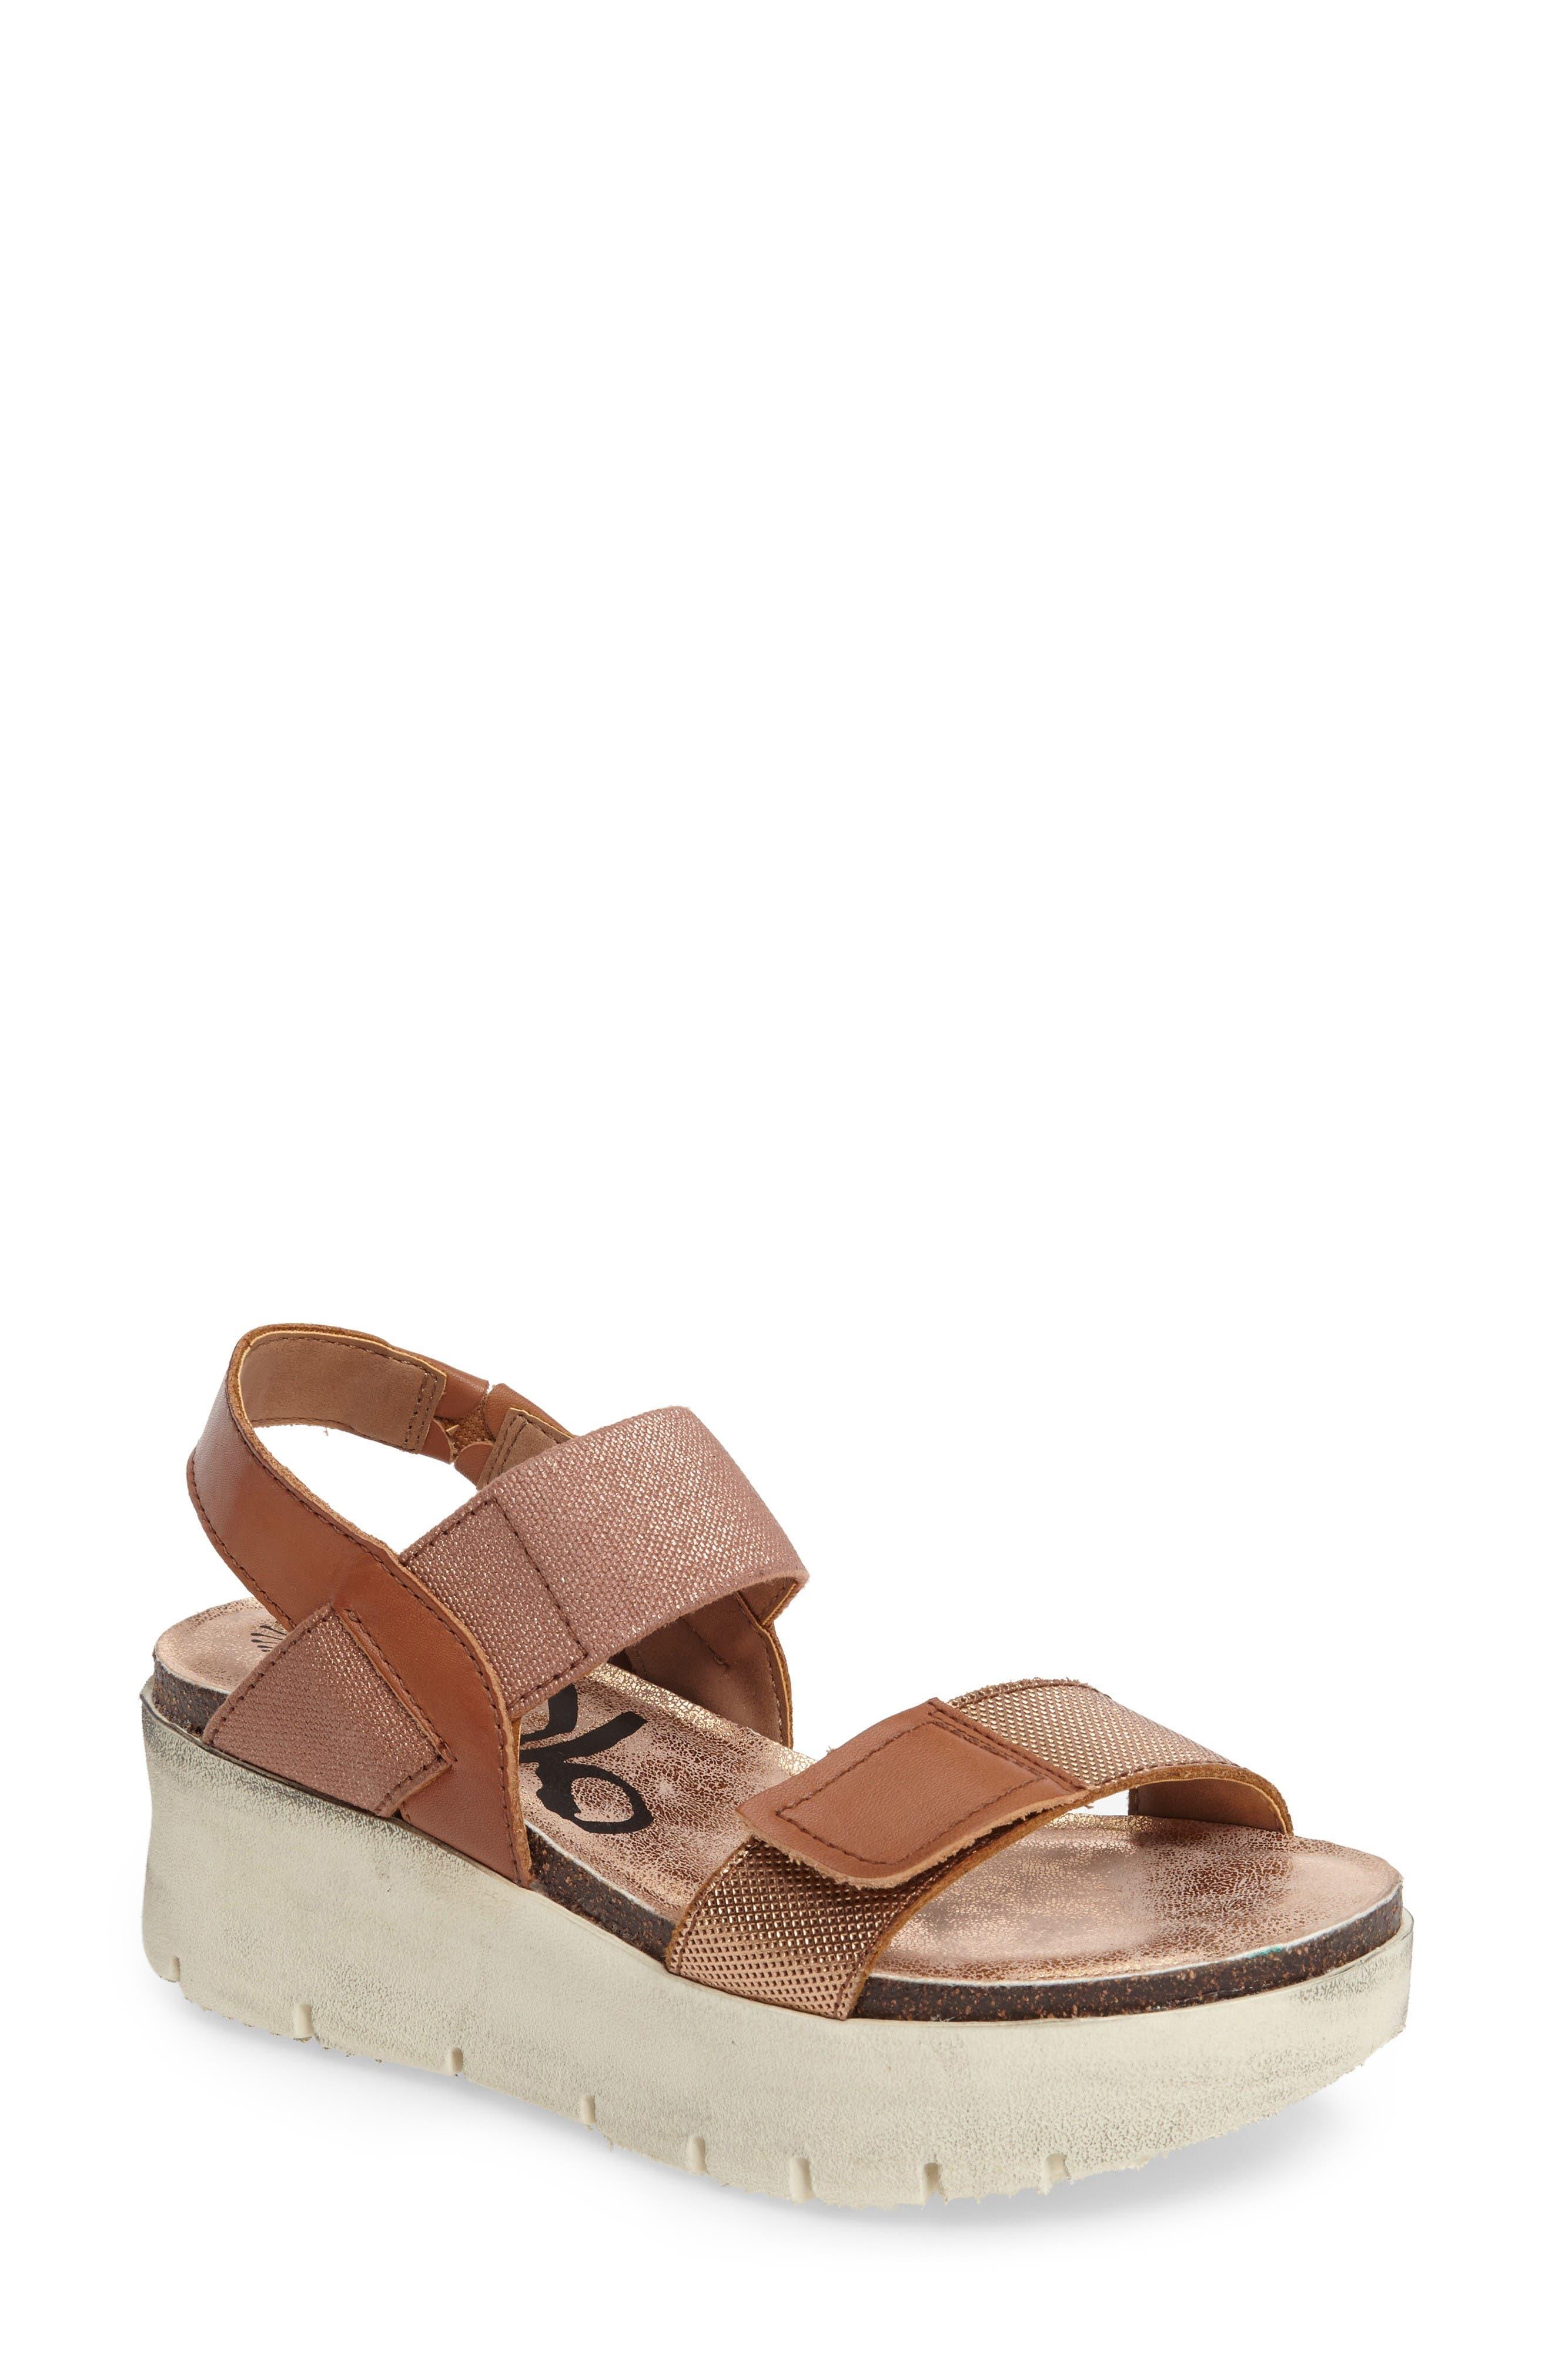 Nova Platform Sandal,                         Main,                         color, Copper Leather